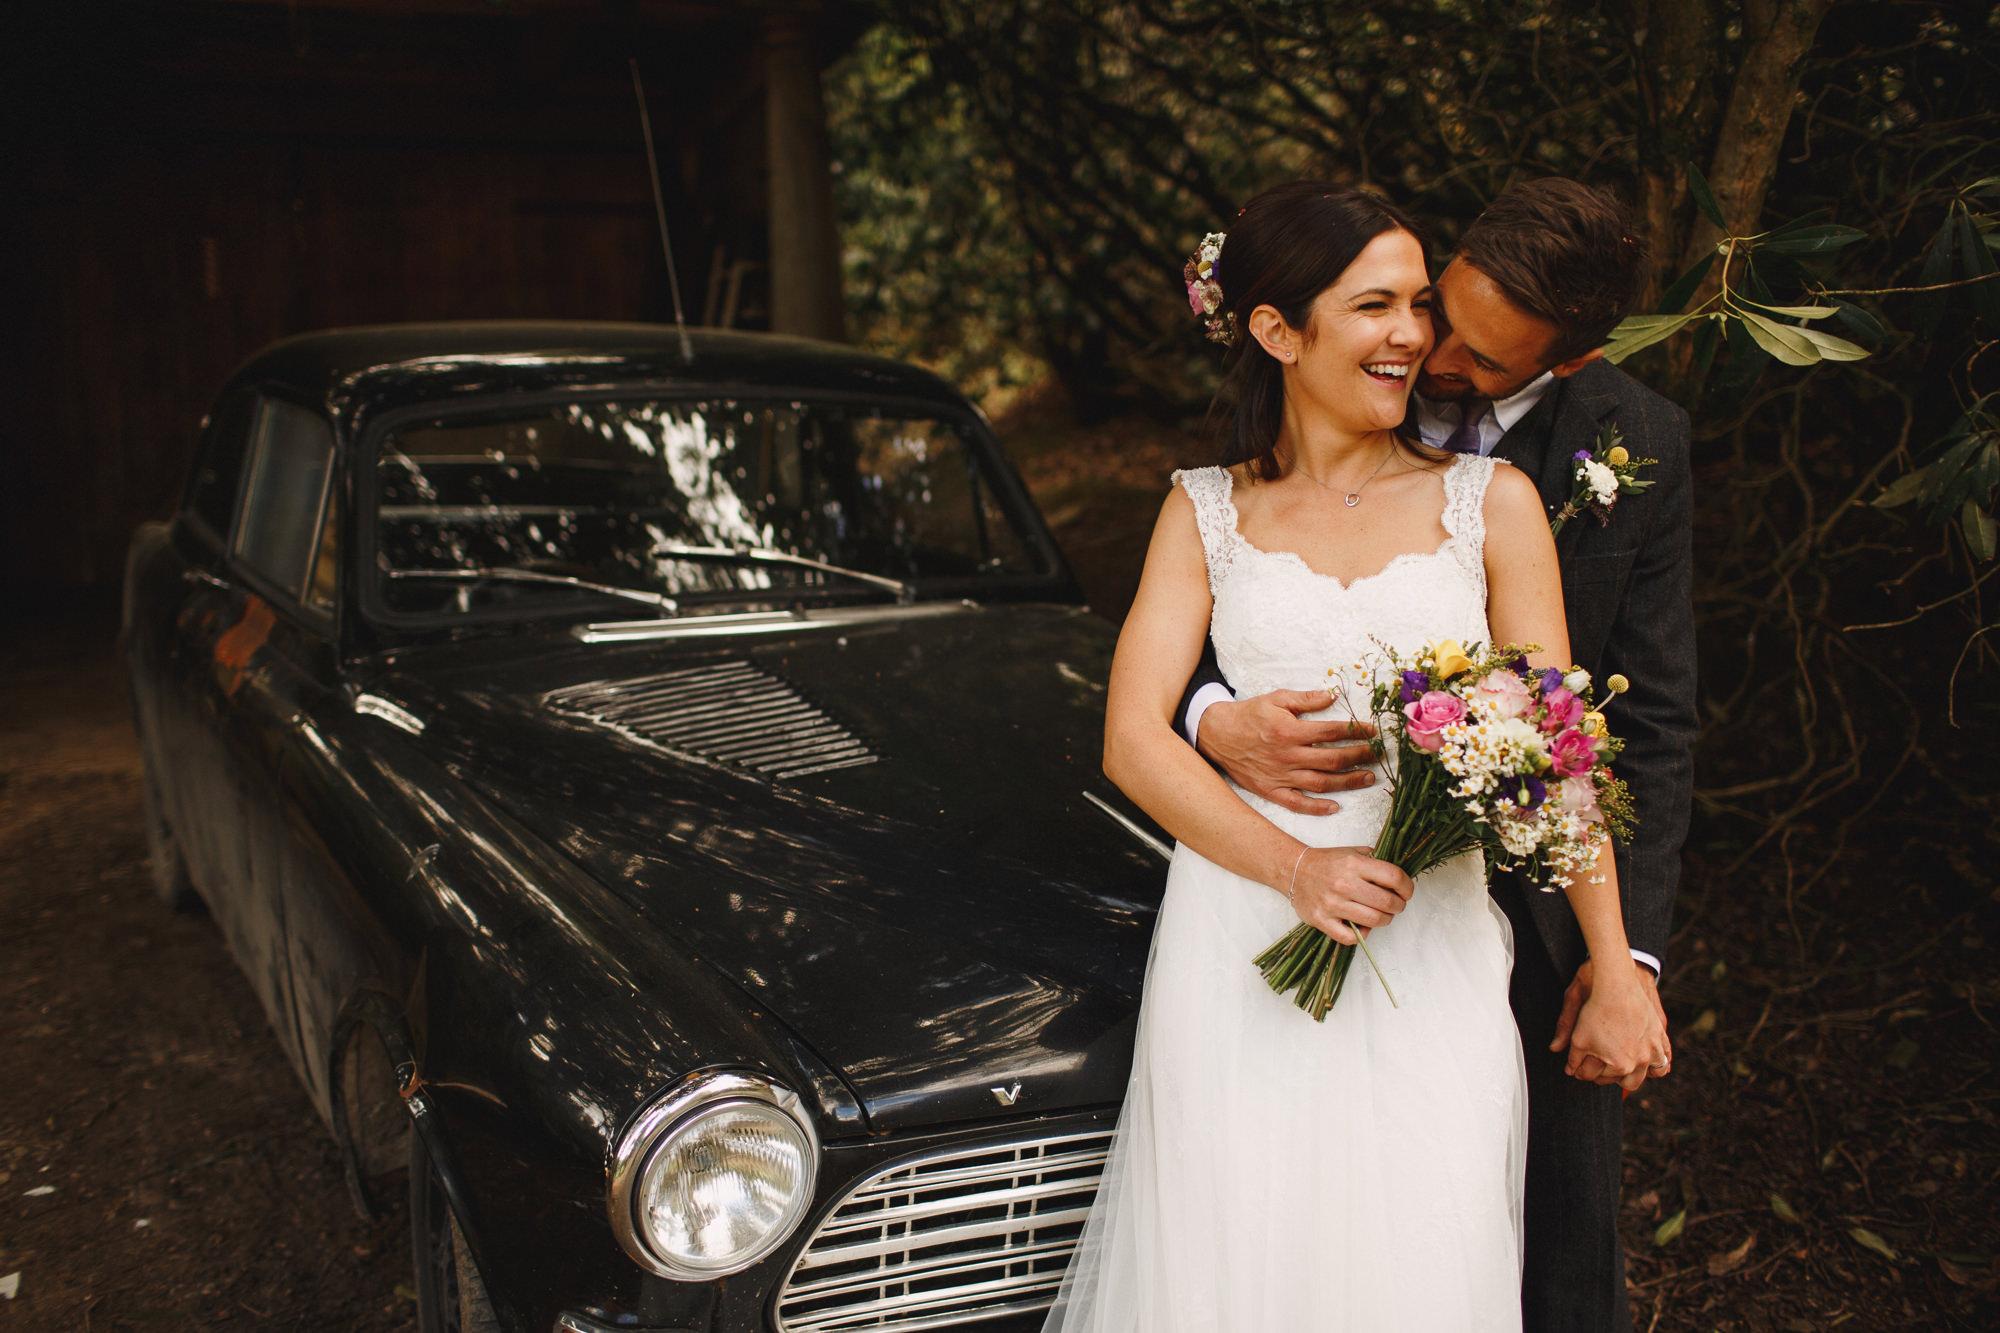 Walcot hall wedding photography shropshire 21